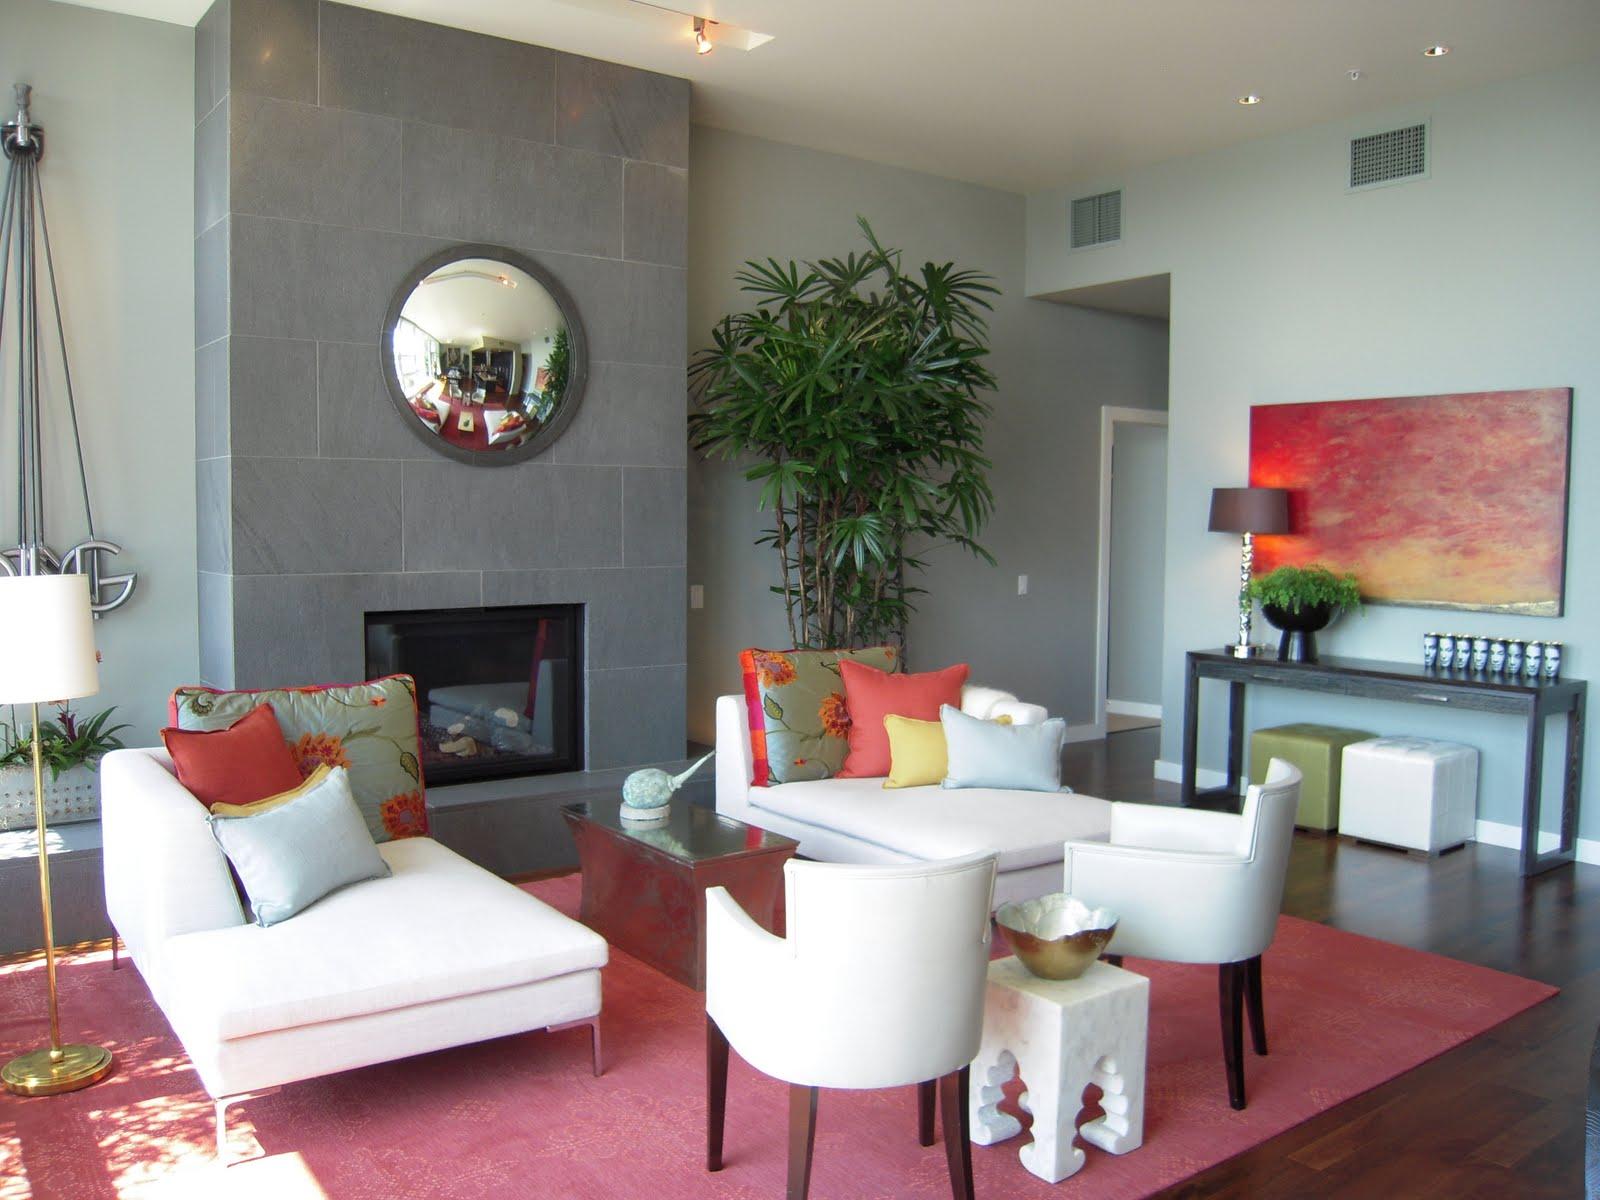 Portland oregon interior design blog decorating budget for How much money does a interior designer make